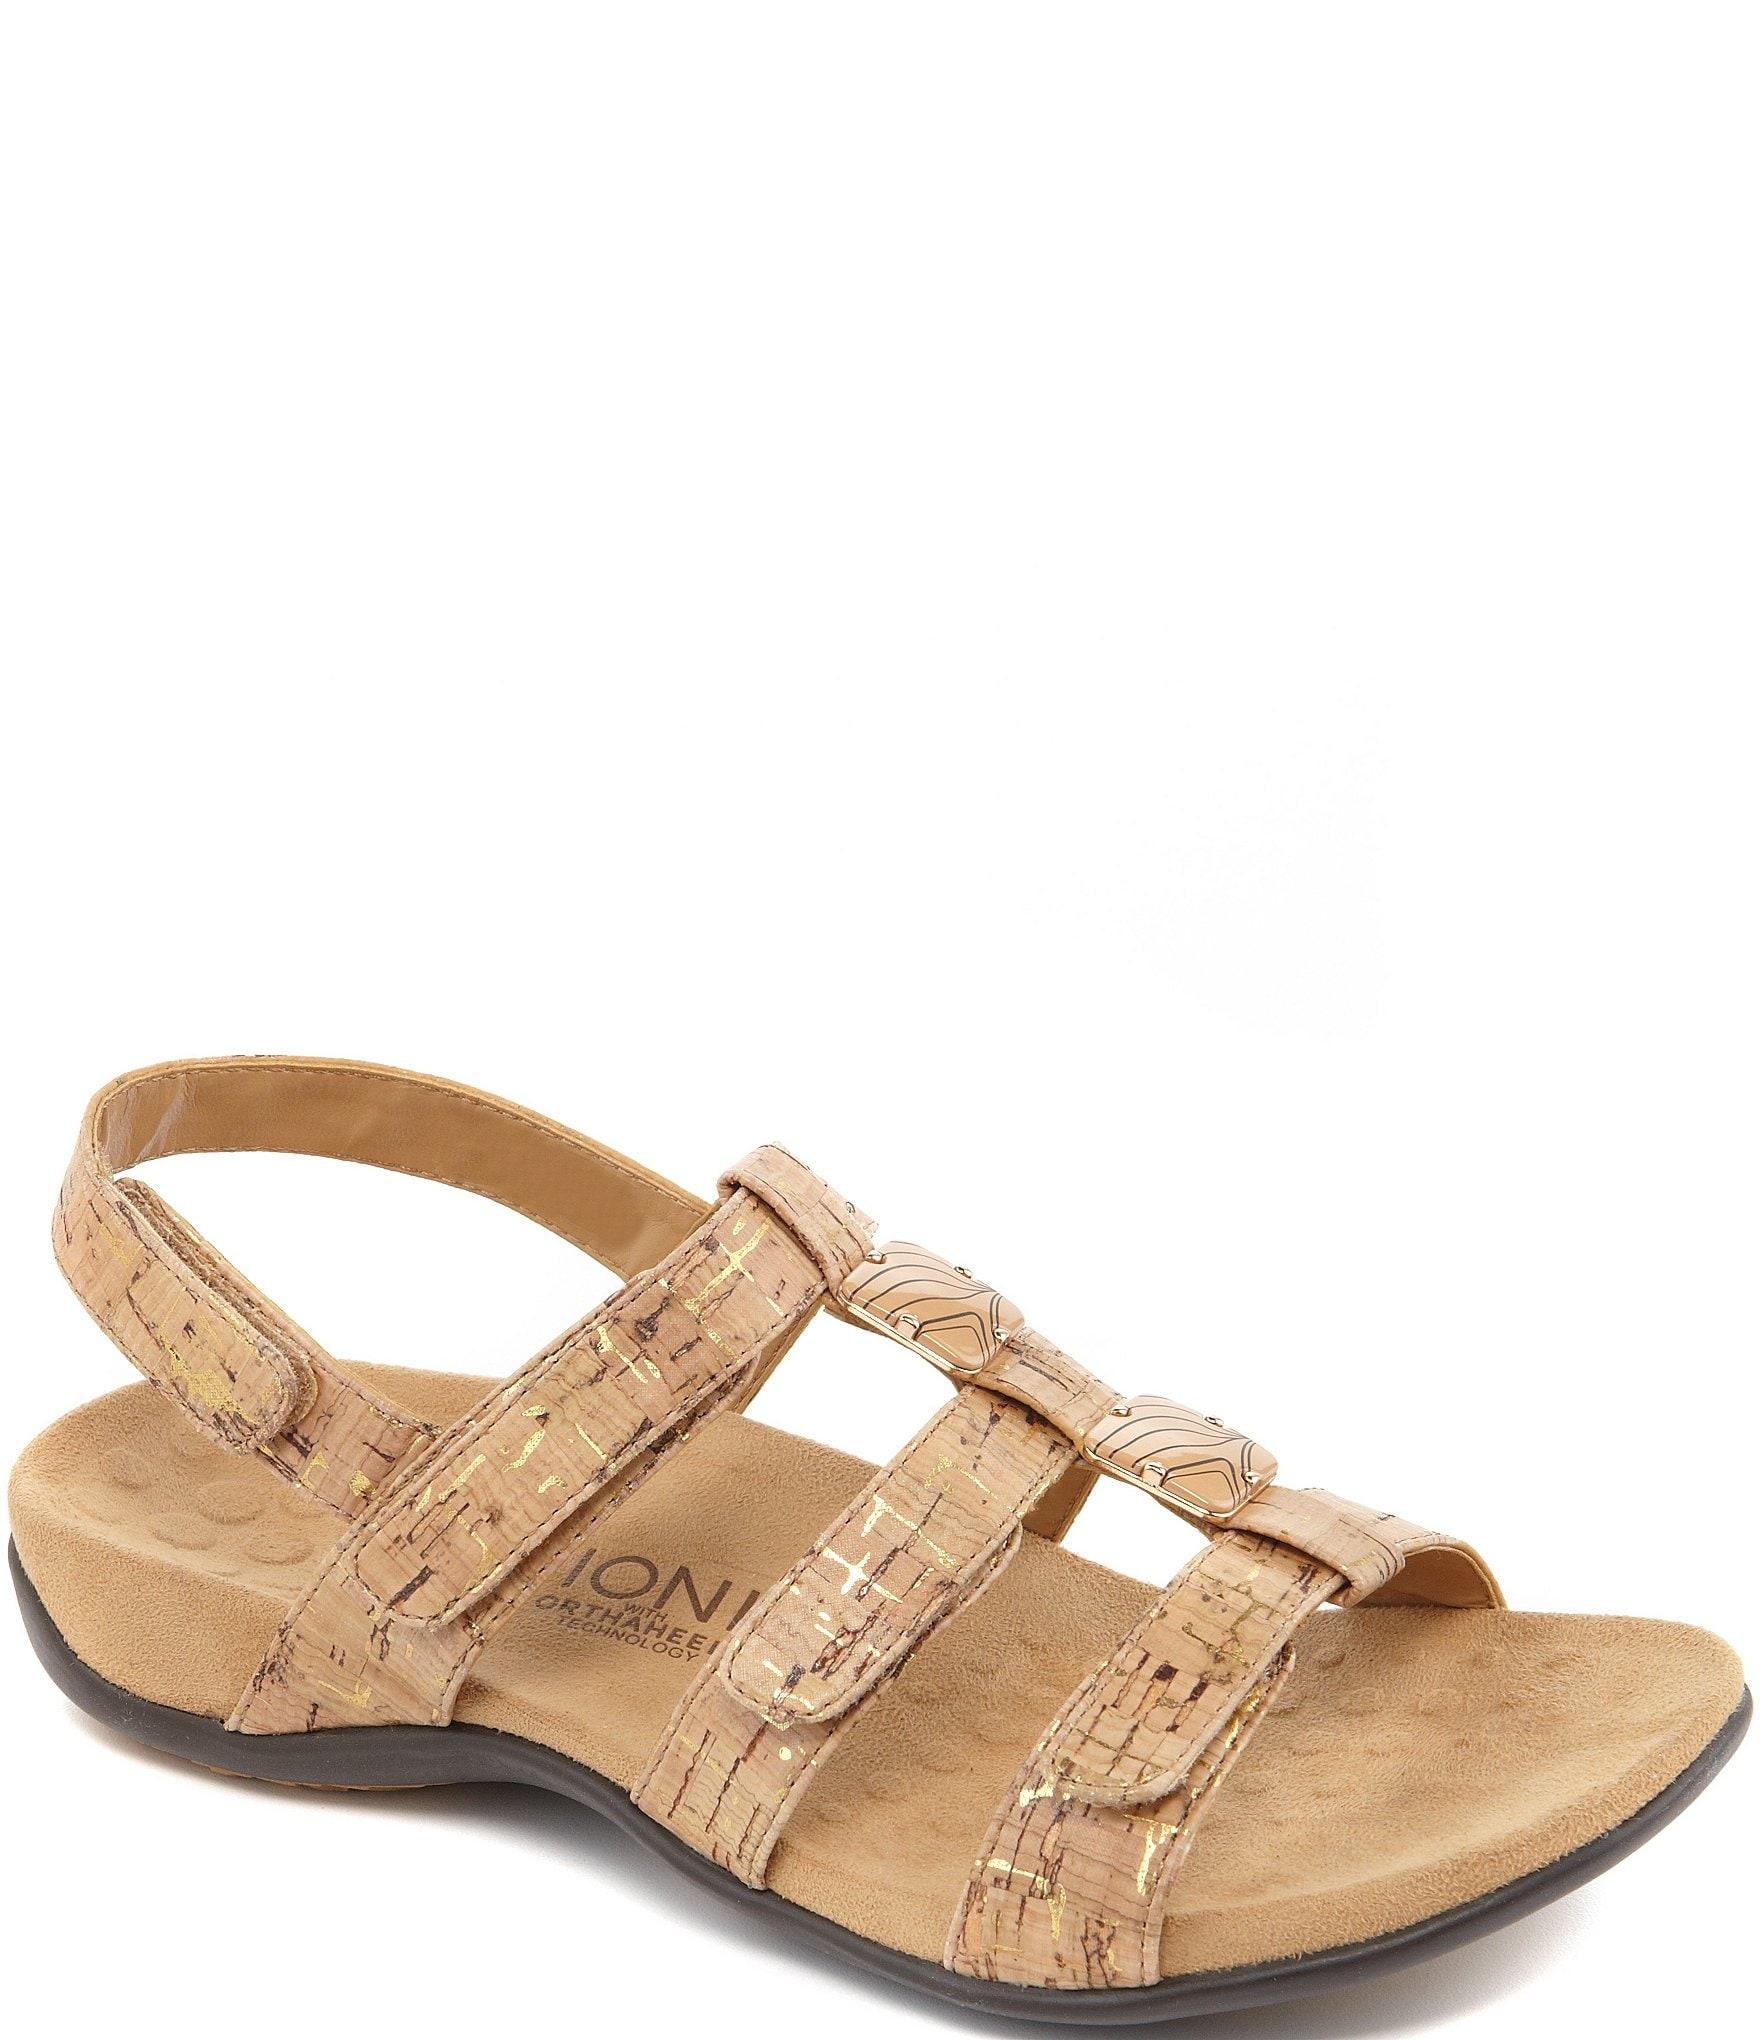 766ca6e54d9e78 Vionic Amber Cork Sandals